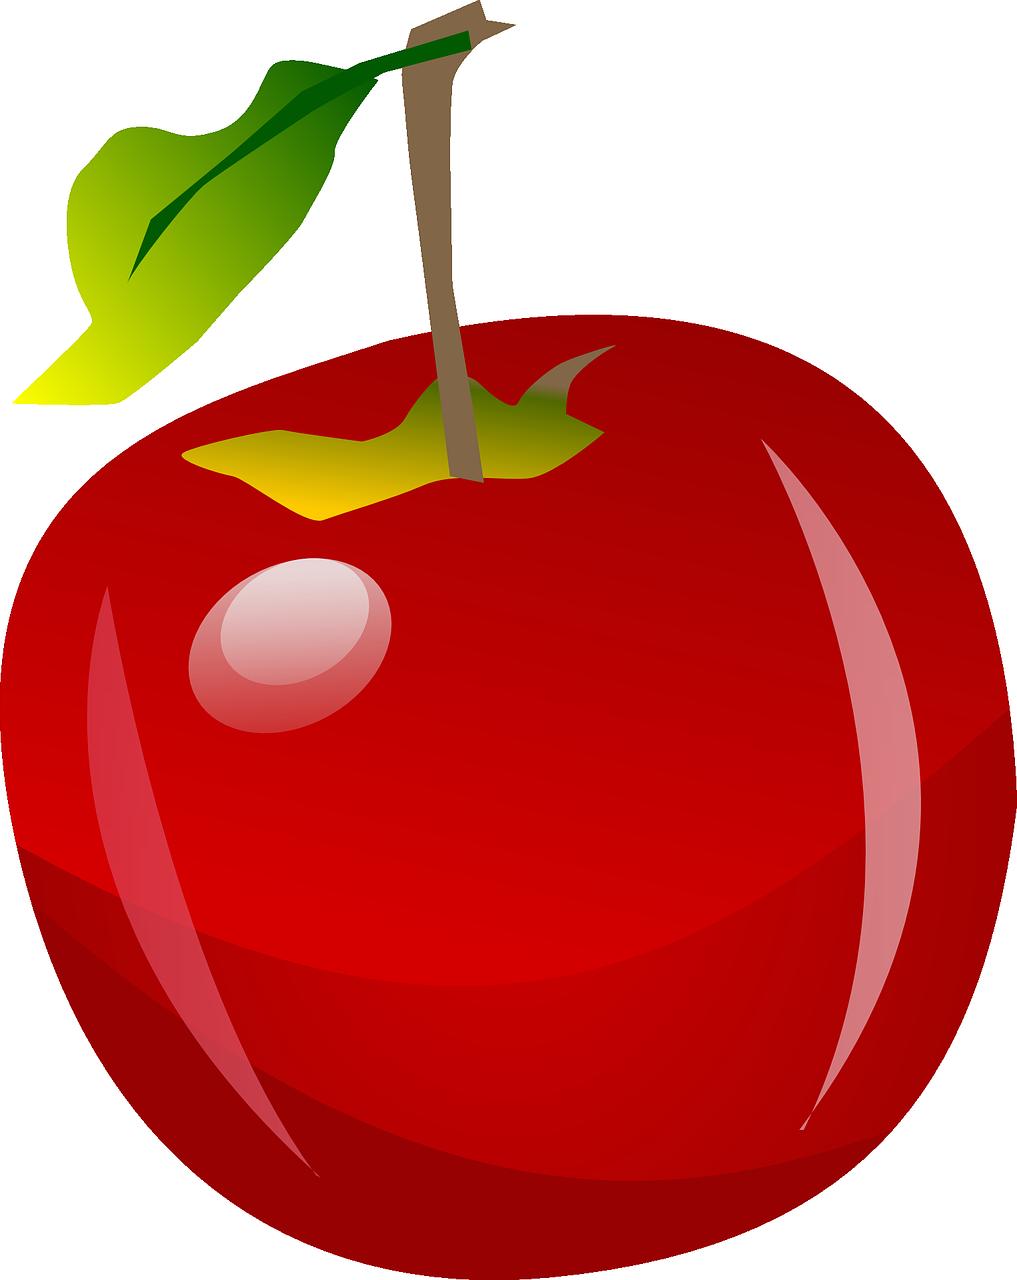 free shiny red apple clip art clipart panda free clipart images rh clipartpanda com red apple clipart free big red apple clipart